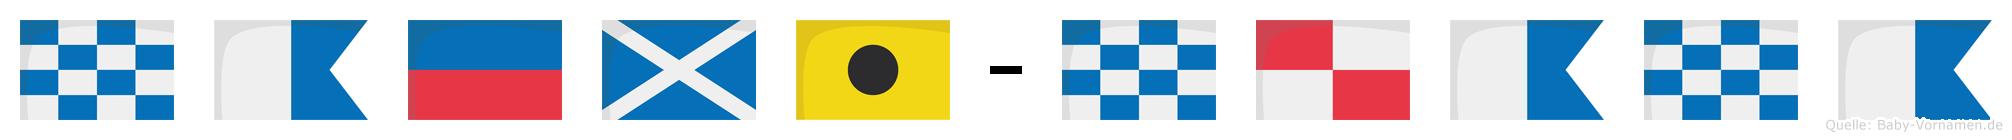 Naemi-Nuana im Flaggenalphabet